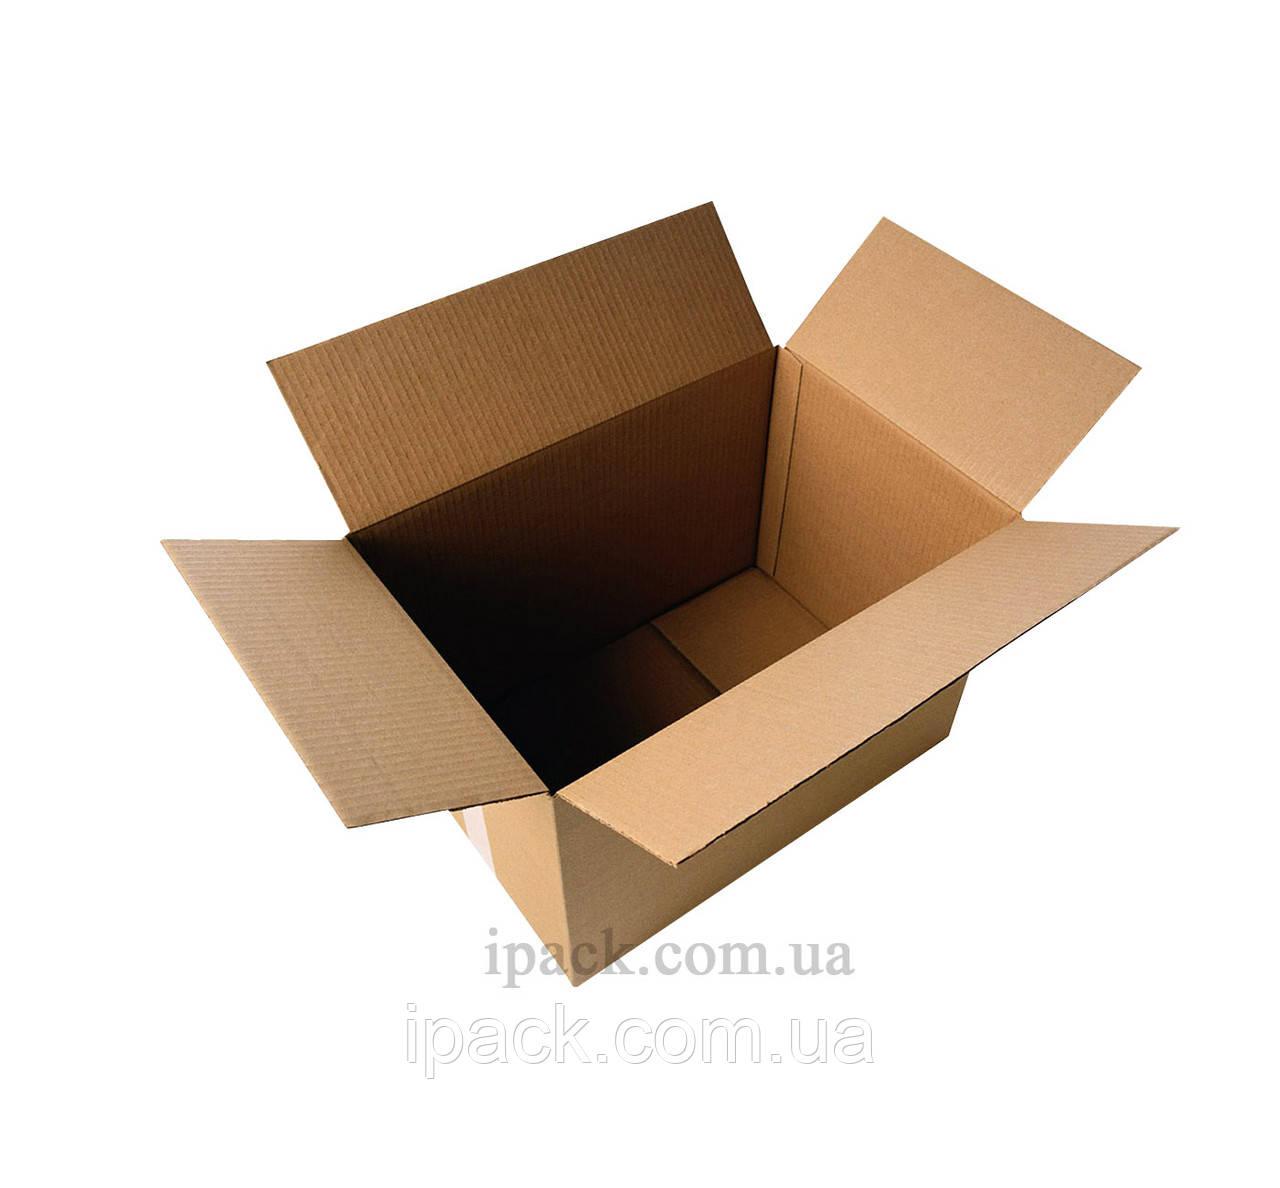 Гофроящик 500*300*440 мм, бурый, четырехклапанный картонный короб